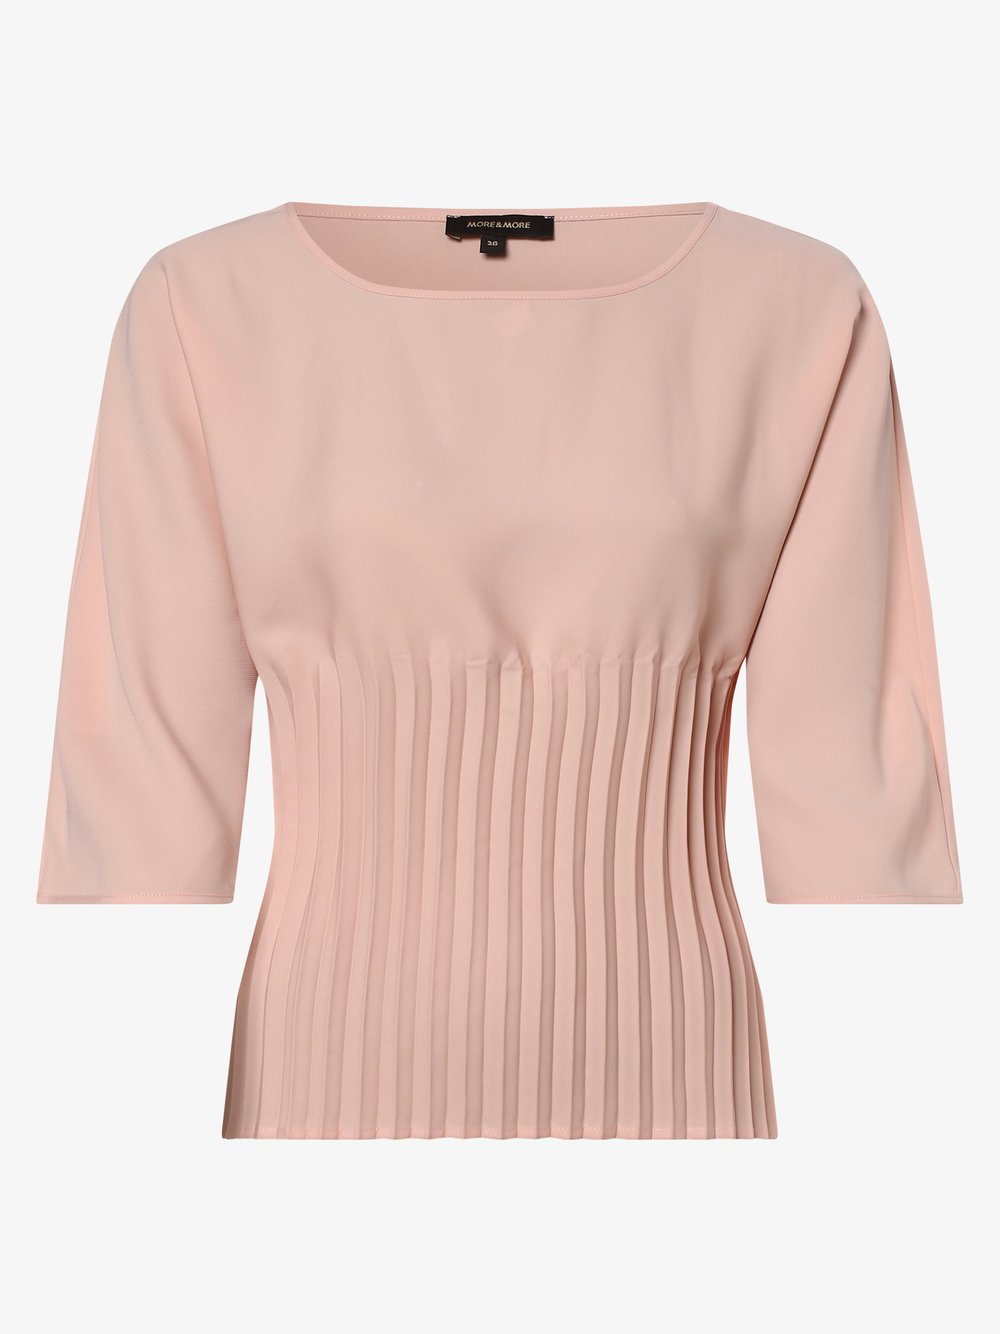 More & More – Bluzka damska, różowy Van Graaf 470481-0001